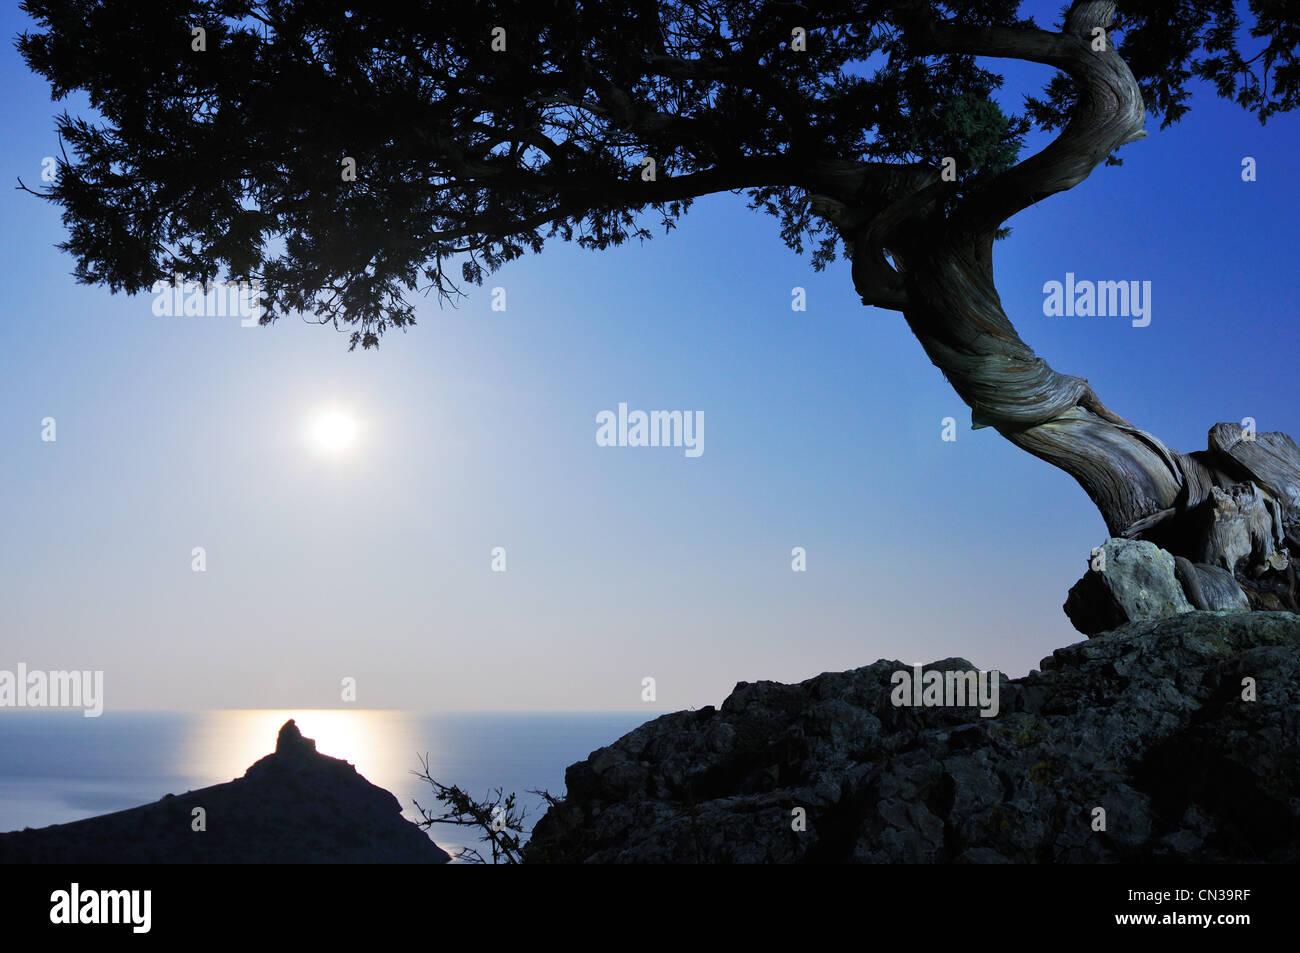 Juniper tree and Black Sea in moonlight, Novyi Svit village area, Crimea, Ukraine - Stock Image